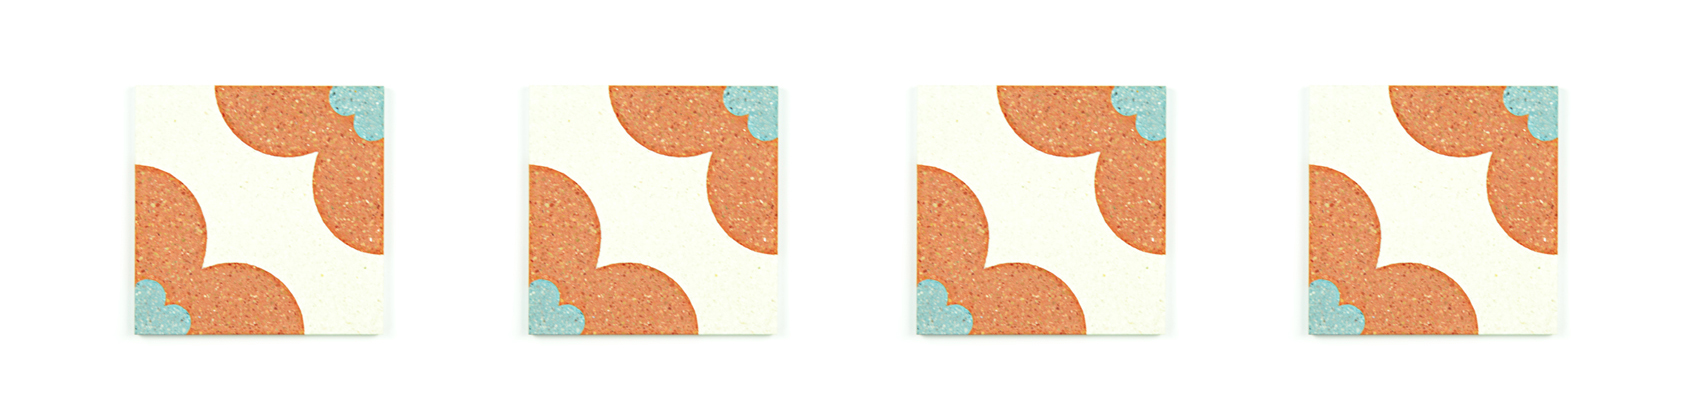 slide-mipa-arancione